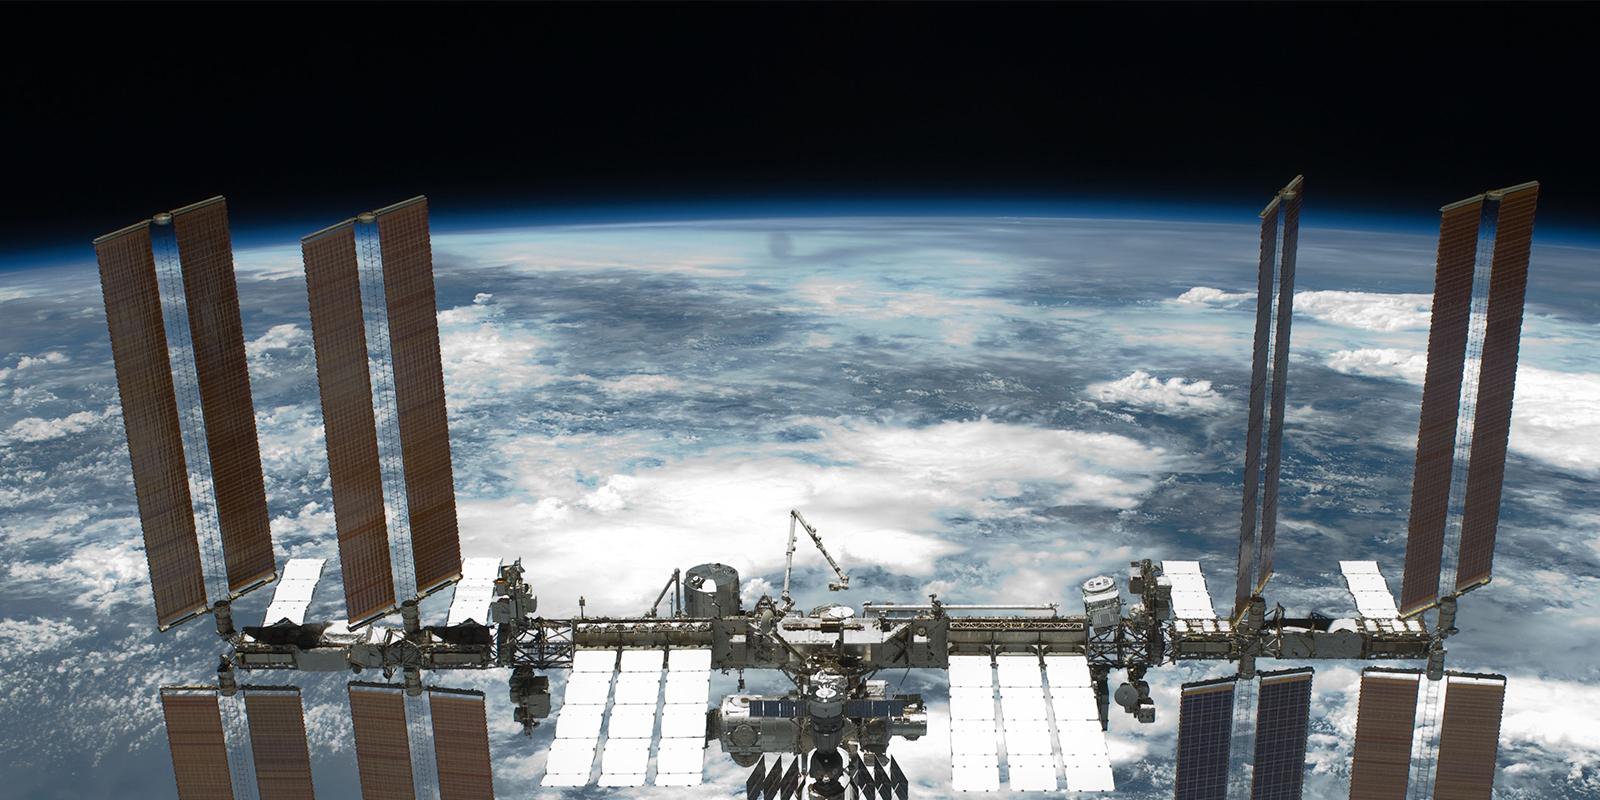 International_Space_Station_after_undocking